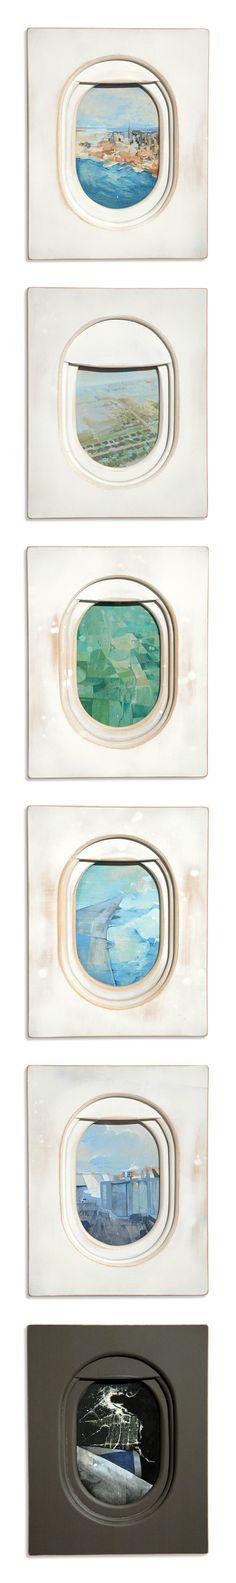 """Six Windows"" by Jim Darling"